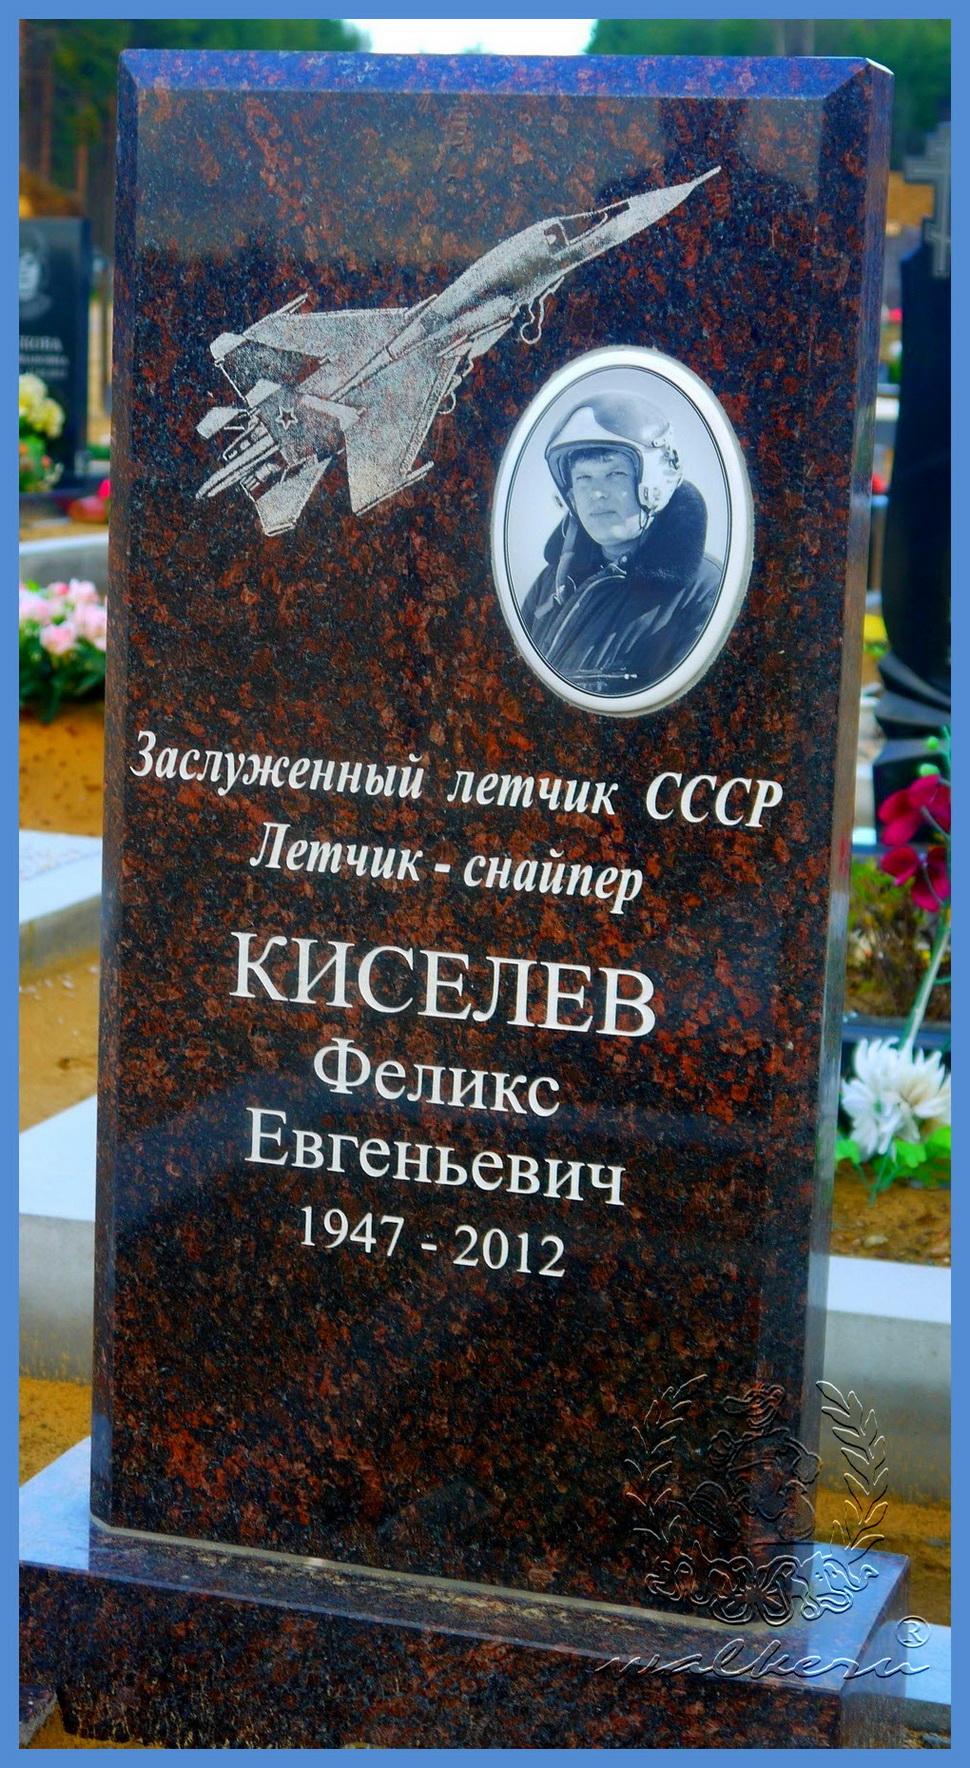 Киселёв Феликс Евгеньевич